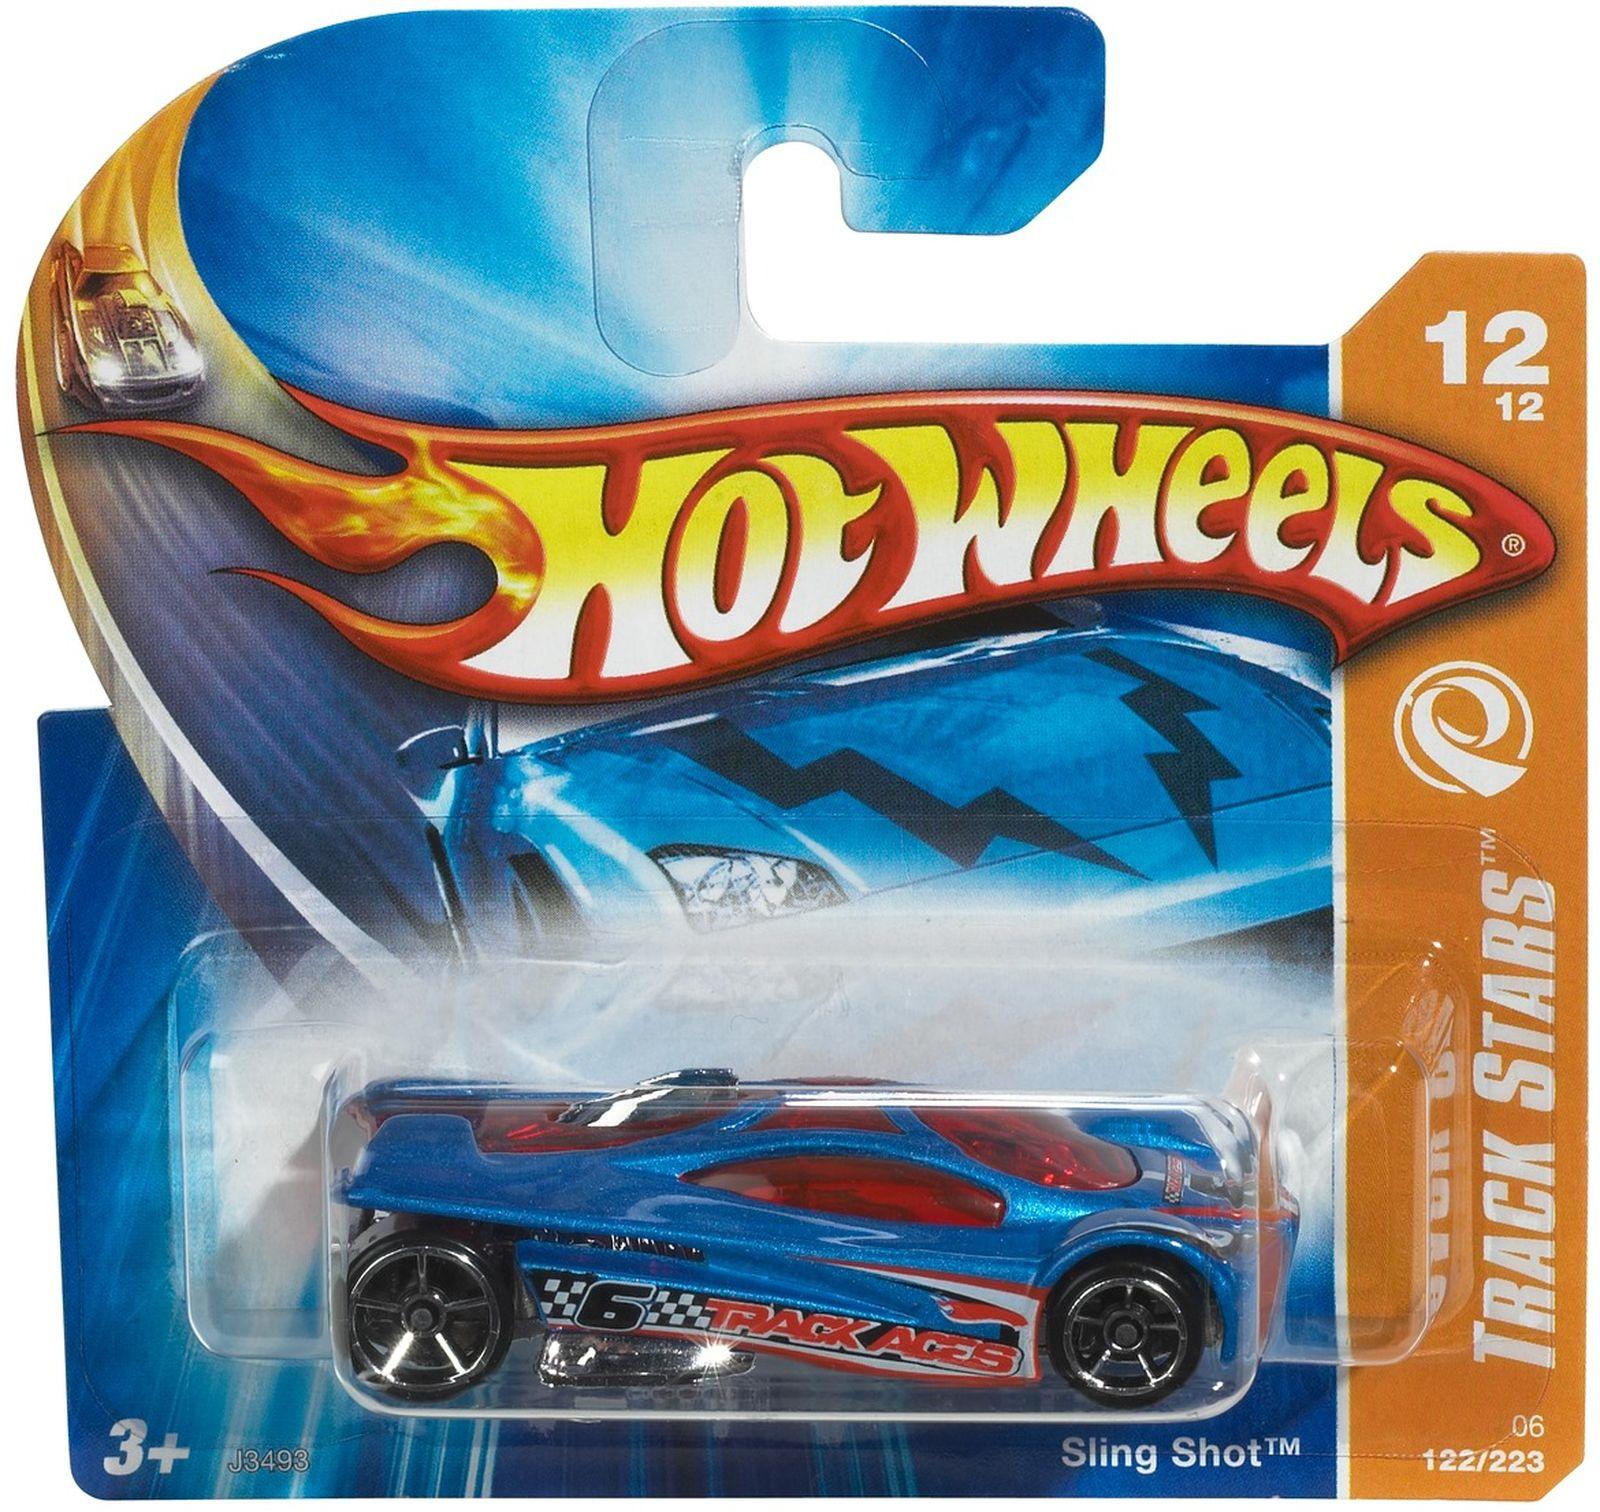 Hot Wheels Базовая машинка в ассортименте hot wheels базовая машинка n3758 17 pagani huayra roadster